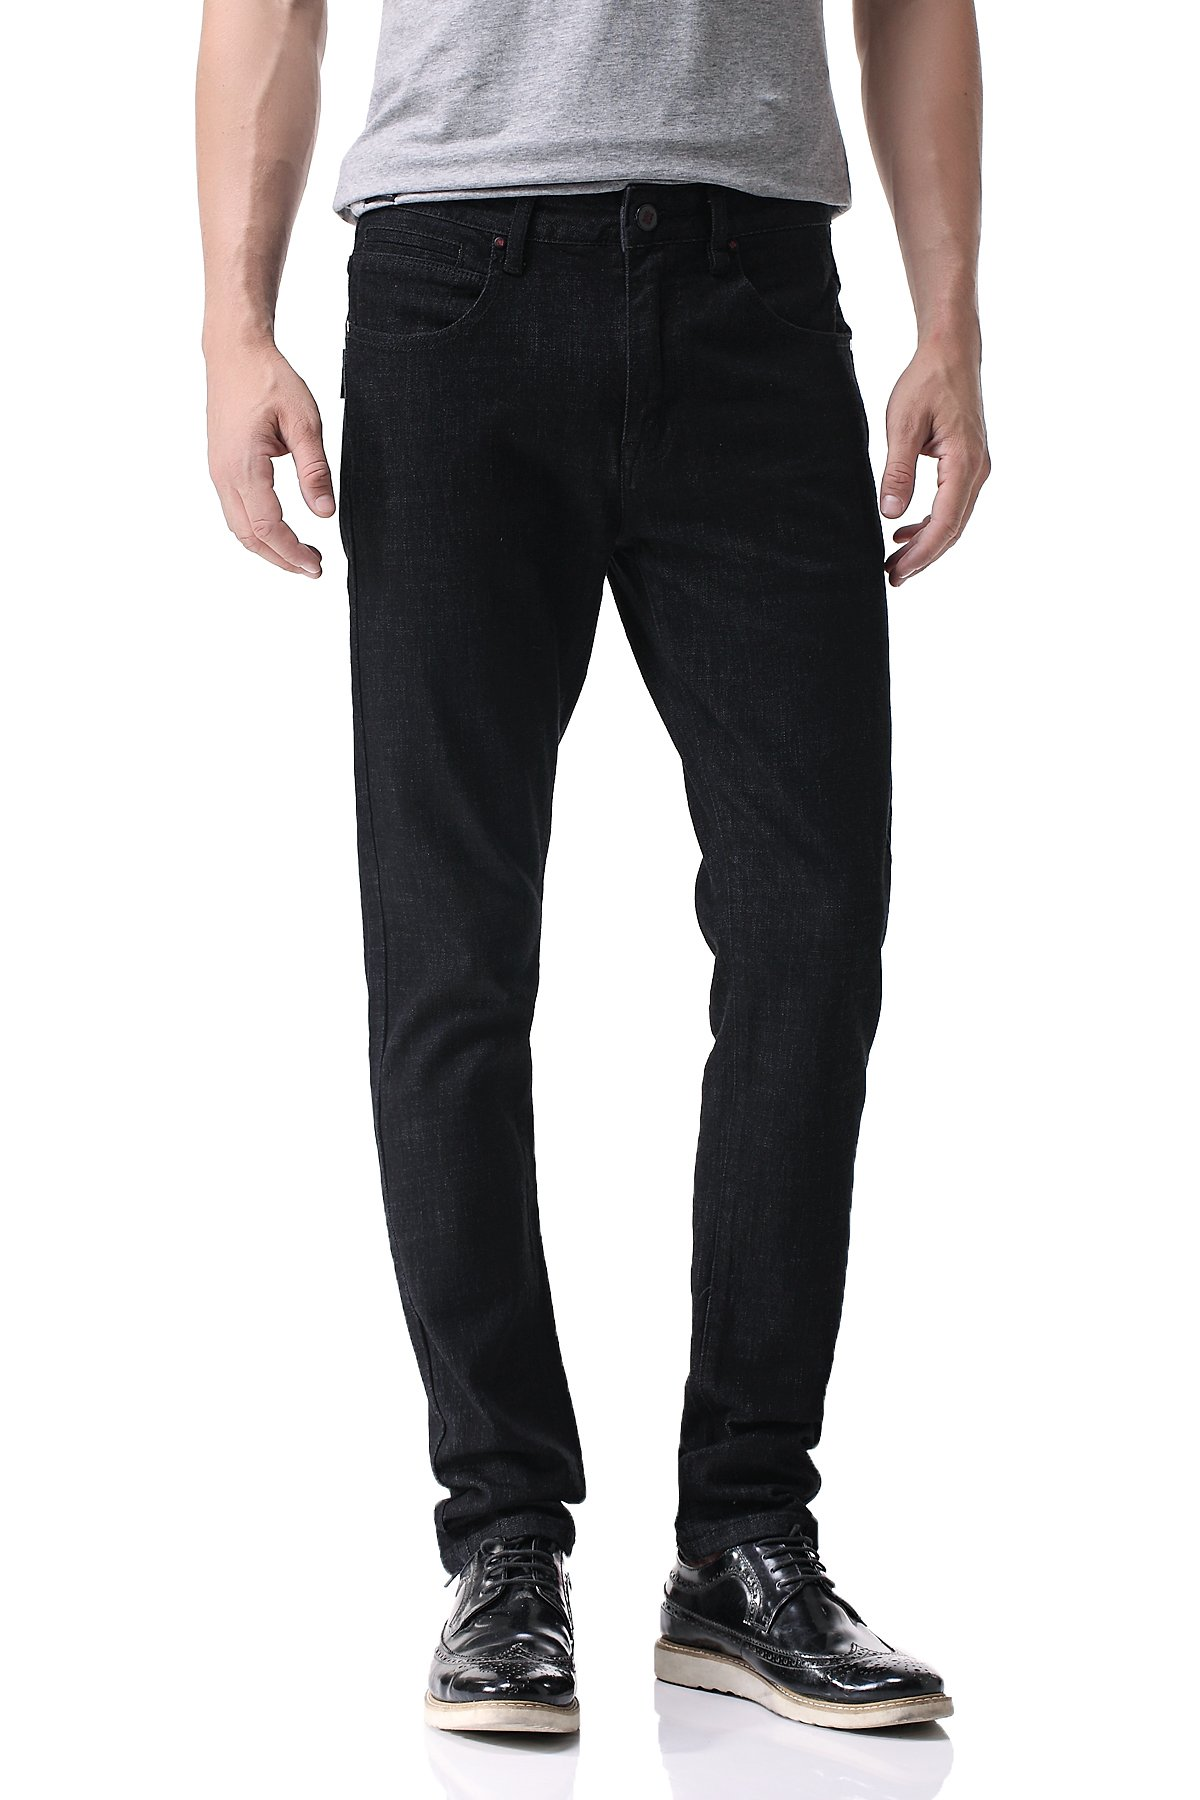 Pau1Hami1ton D-02 Men's 5-Pocket Slim Jeans(34,Black)